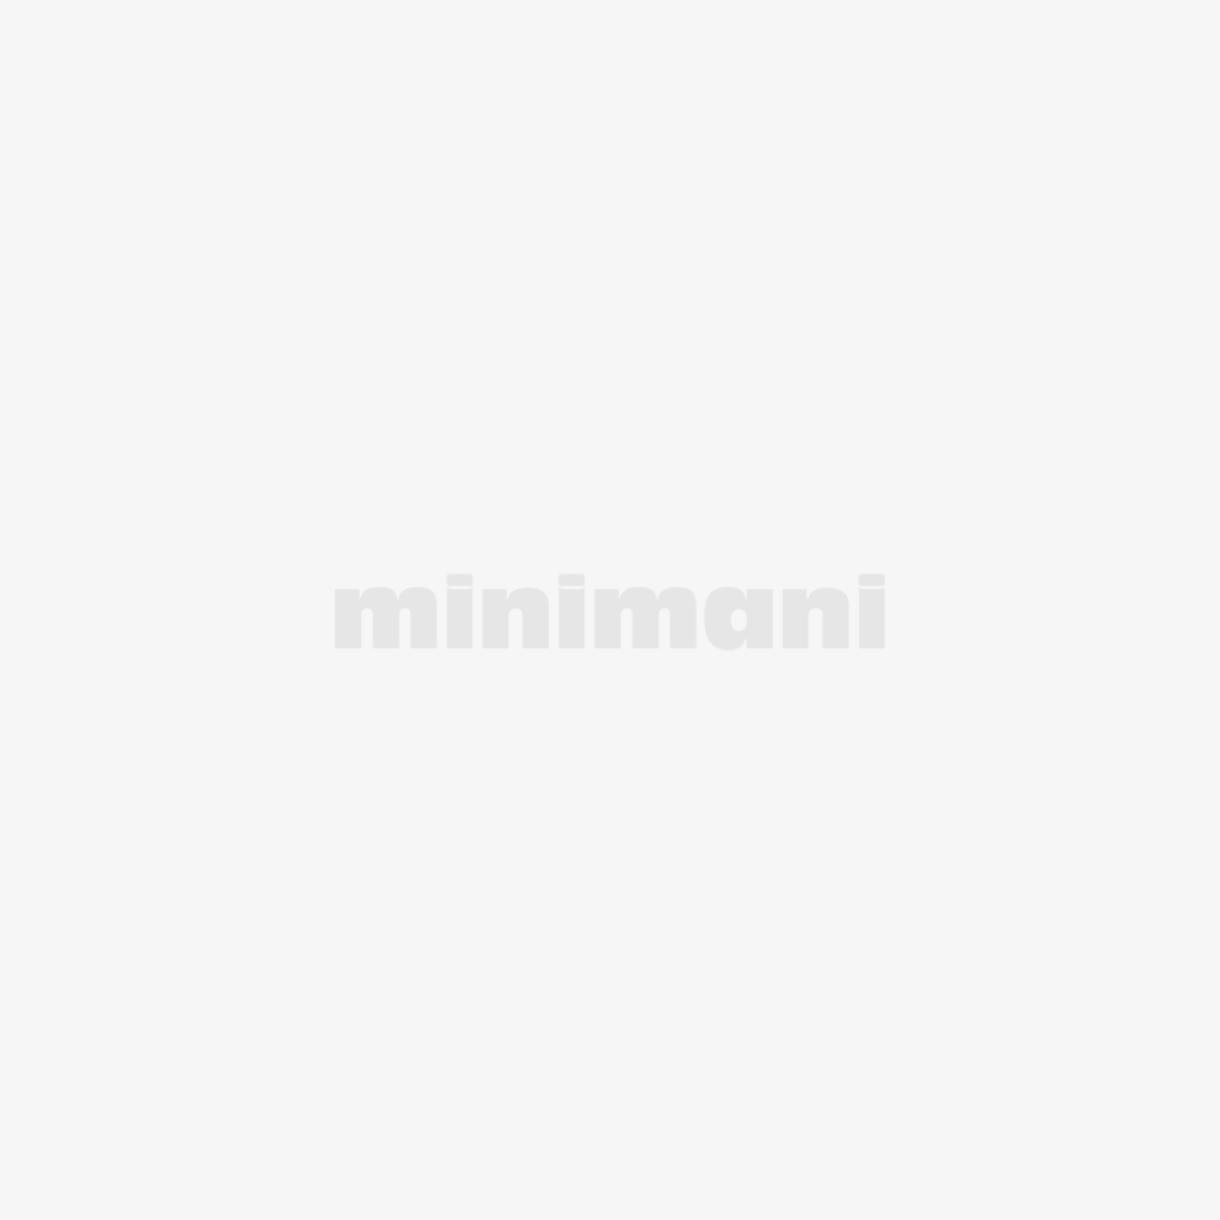 M-FILTER RAITISILMASUODATIN MAC 8035 ASTRA G, H, ZAFIRA I